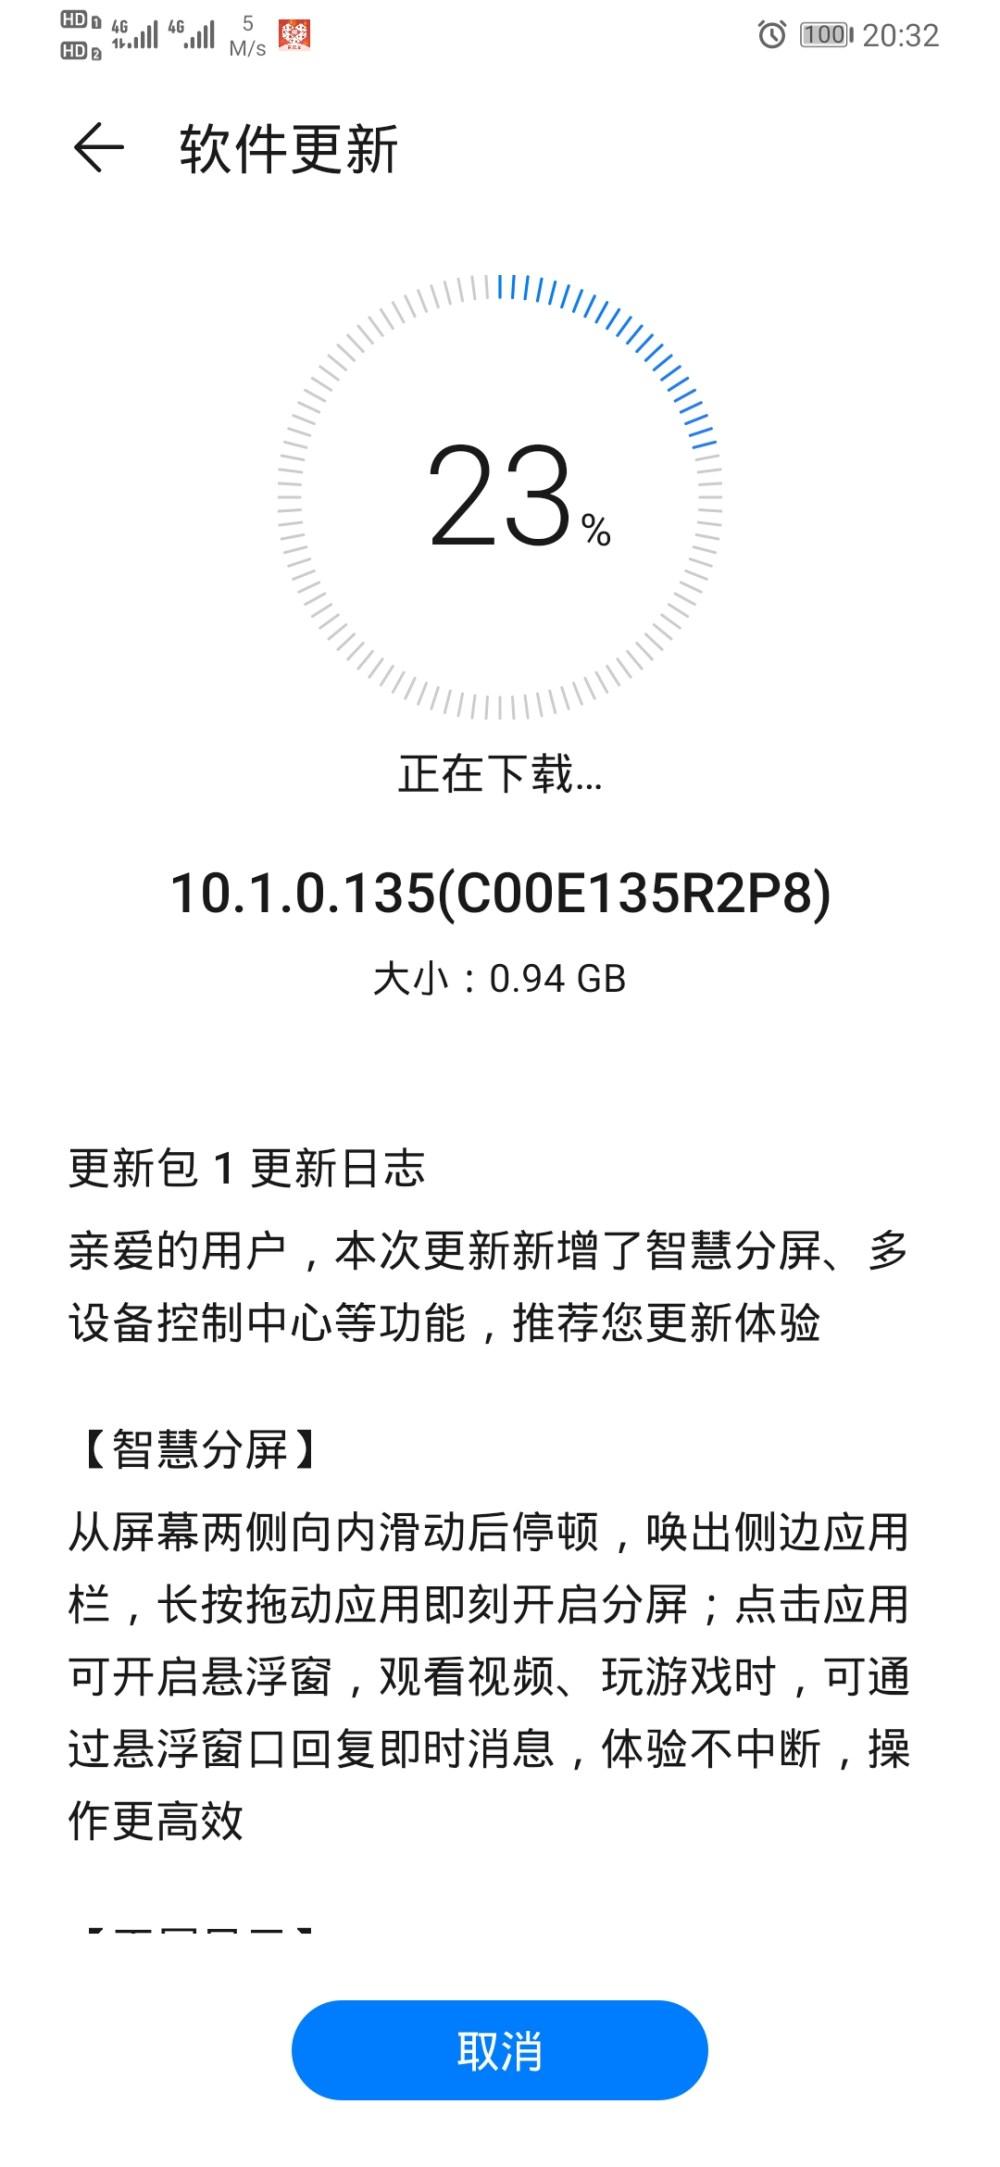 Huawei P30 EMUI 10.1.0.135